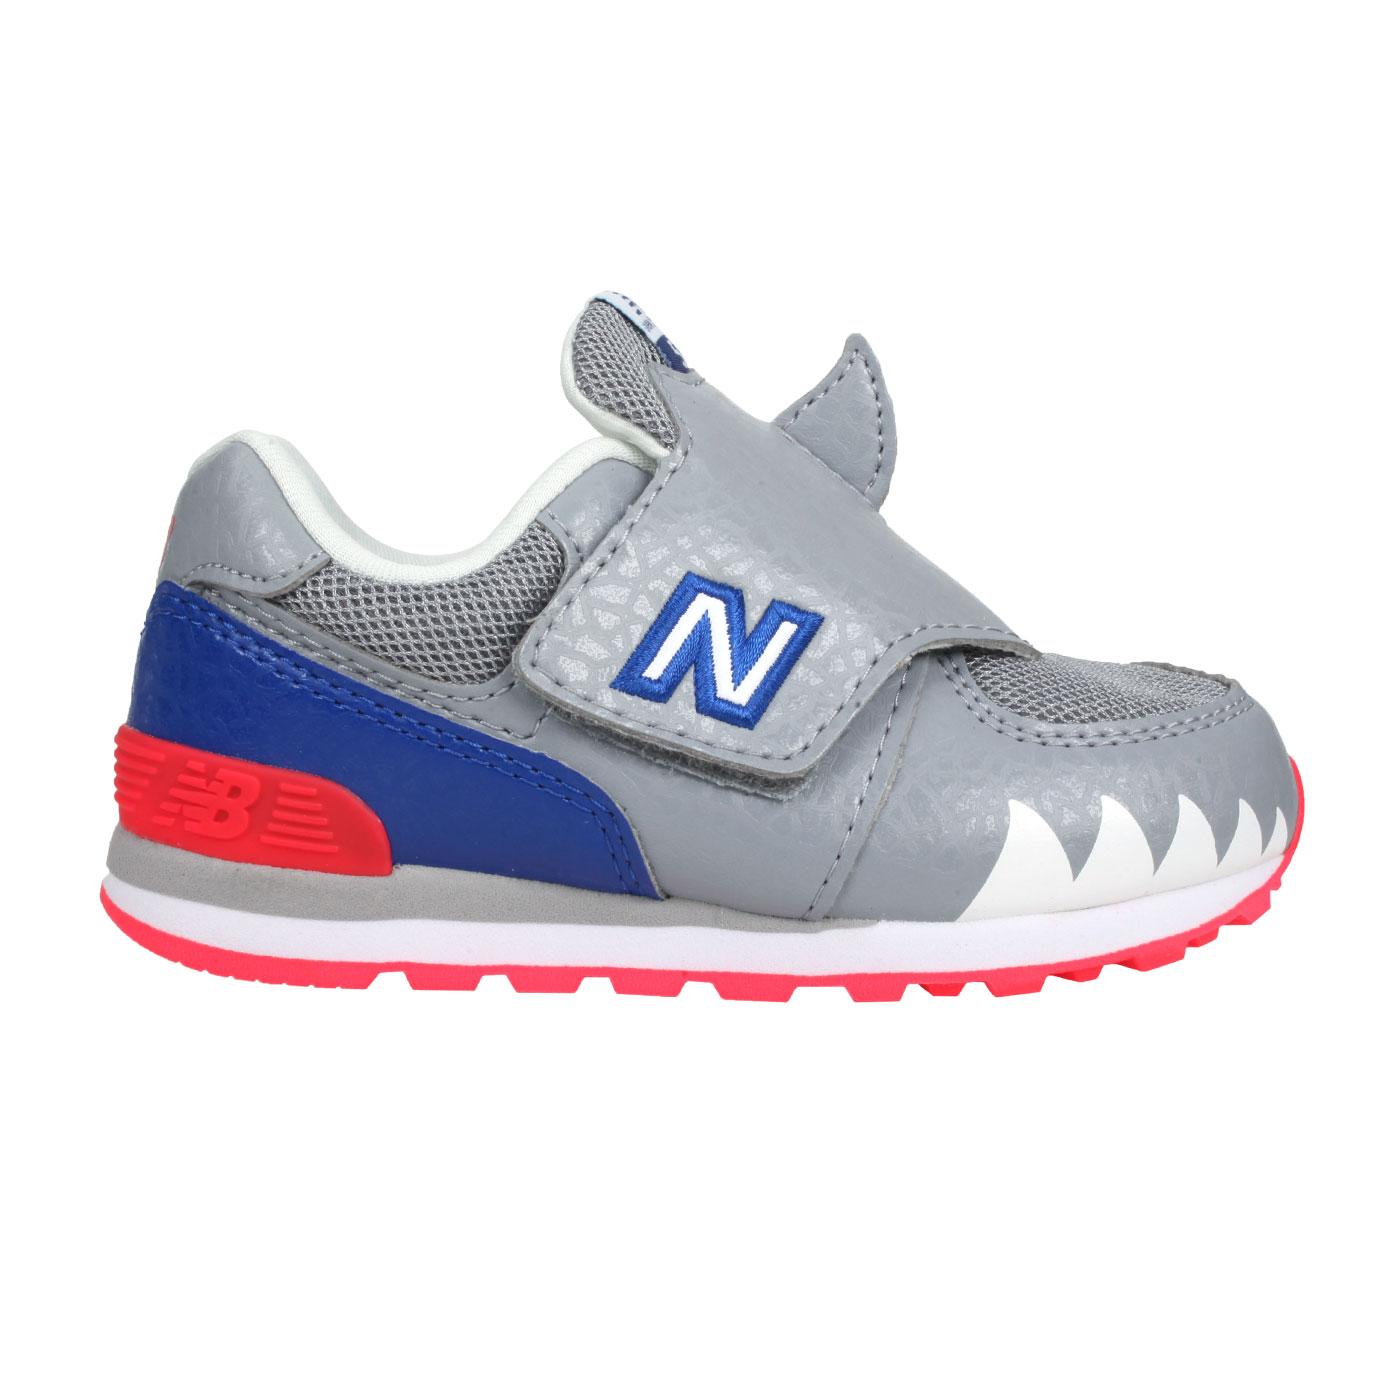 NEW BALANCE 小童休閒鞋 IV574AQS - 灰藍紅